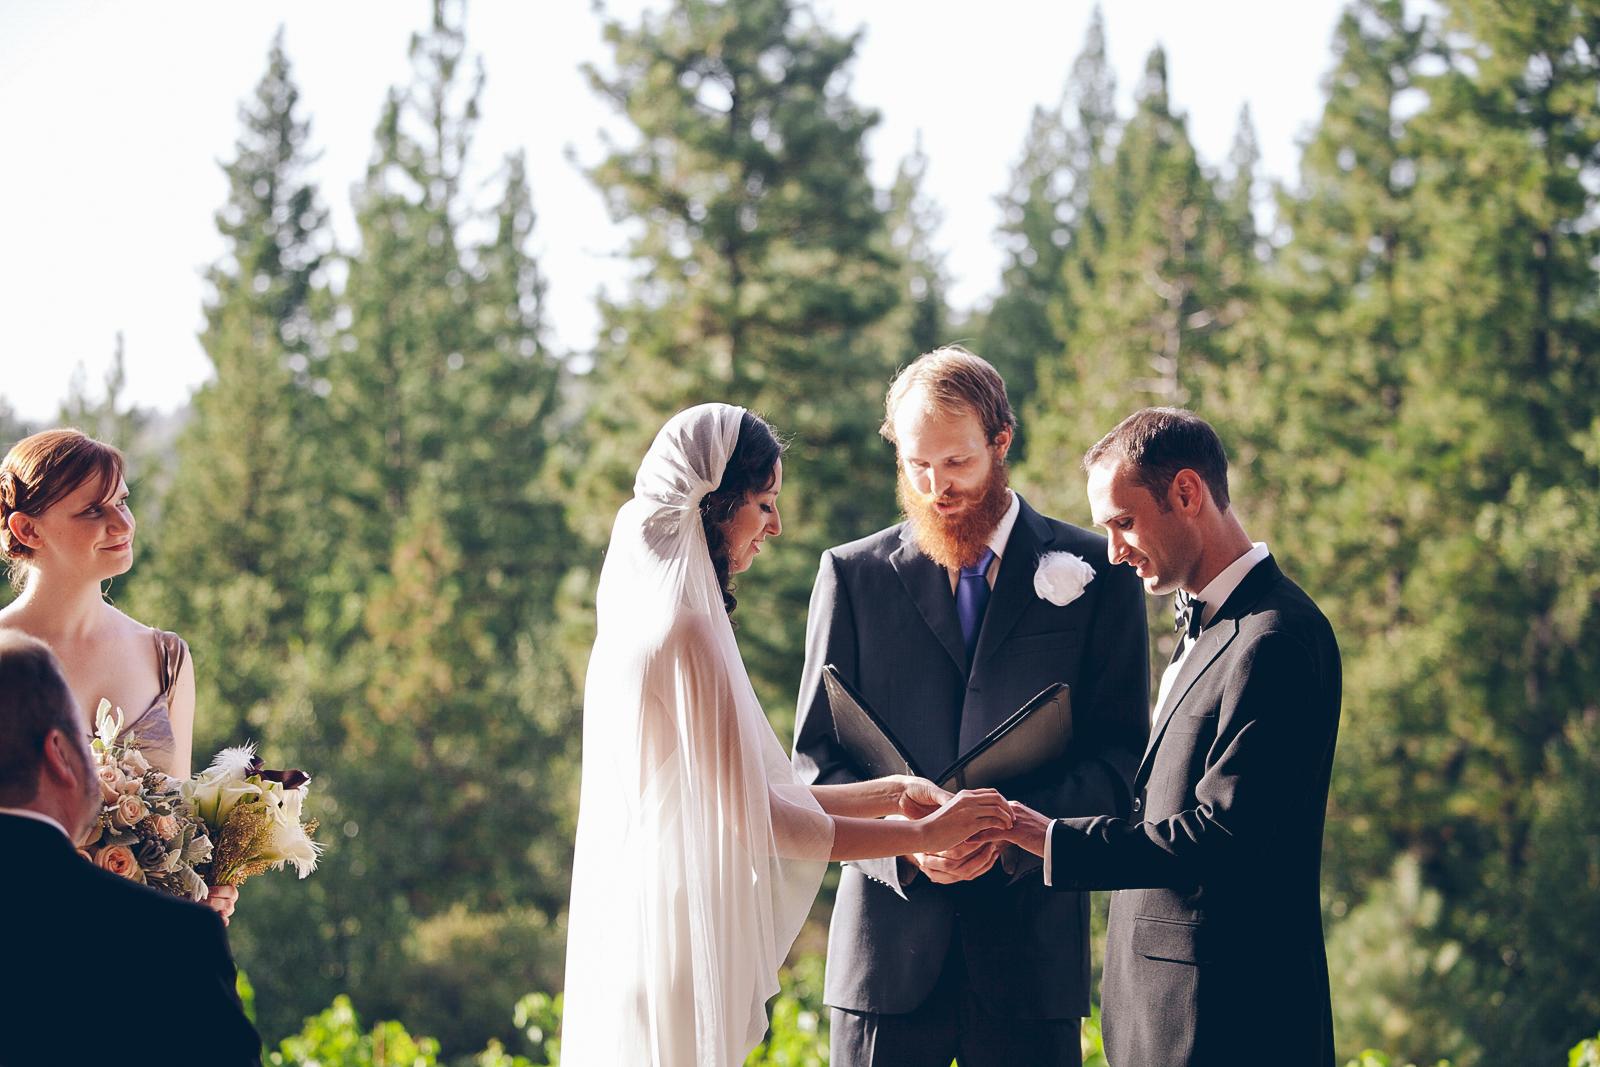 miraflores_winery_wedding_photography_ian_melissa_ebony_siovhan_bokeh_photography_31.jpg